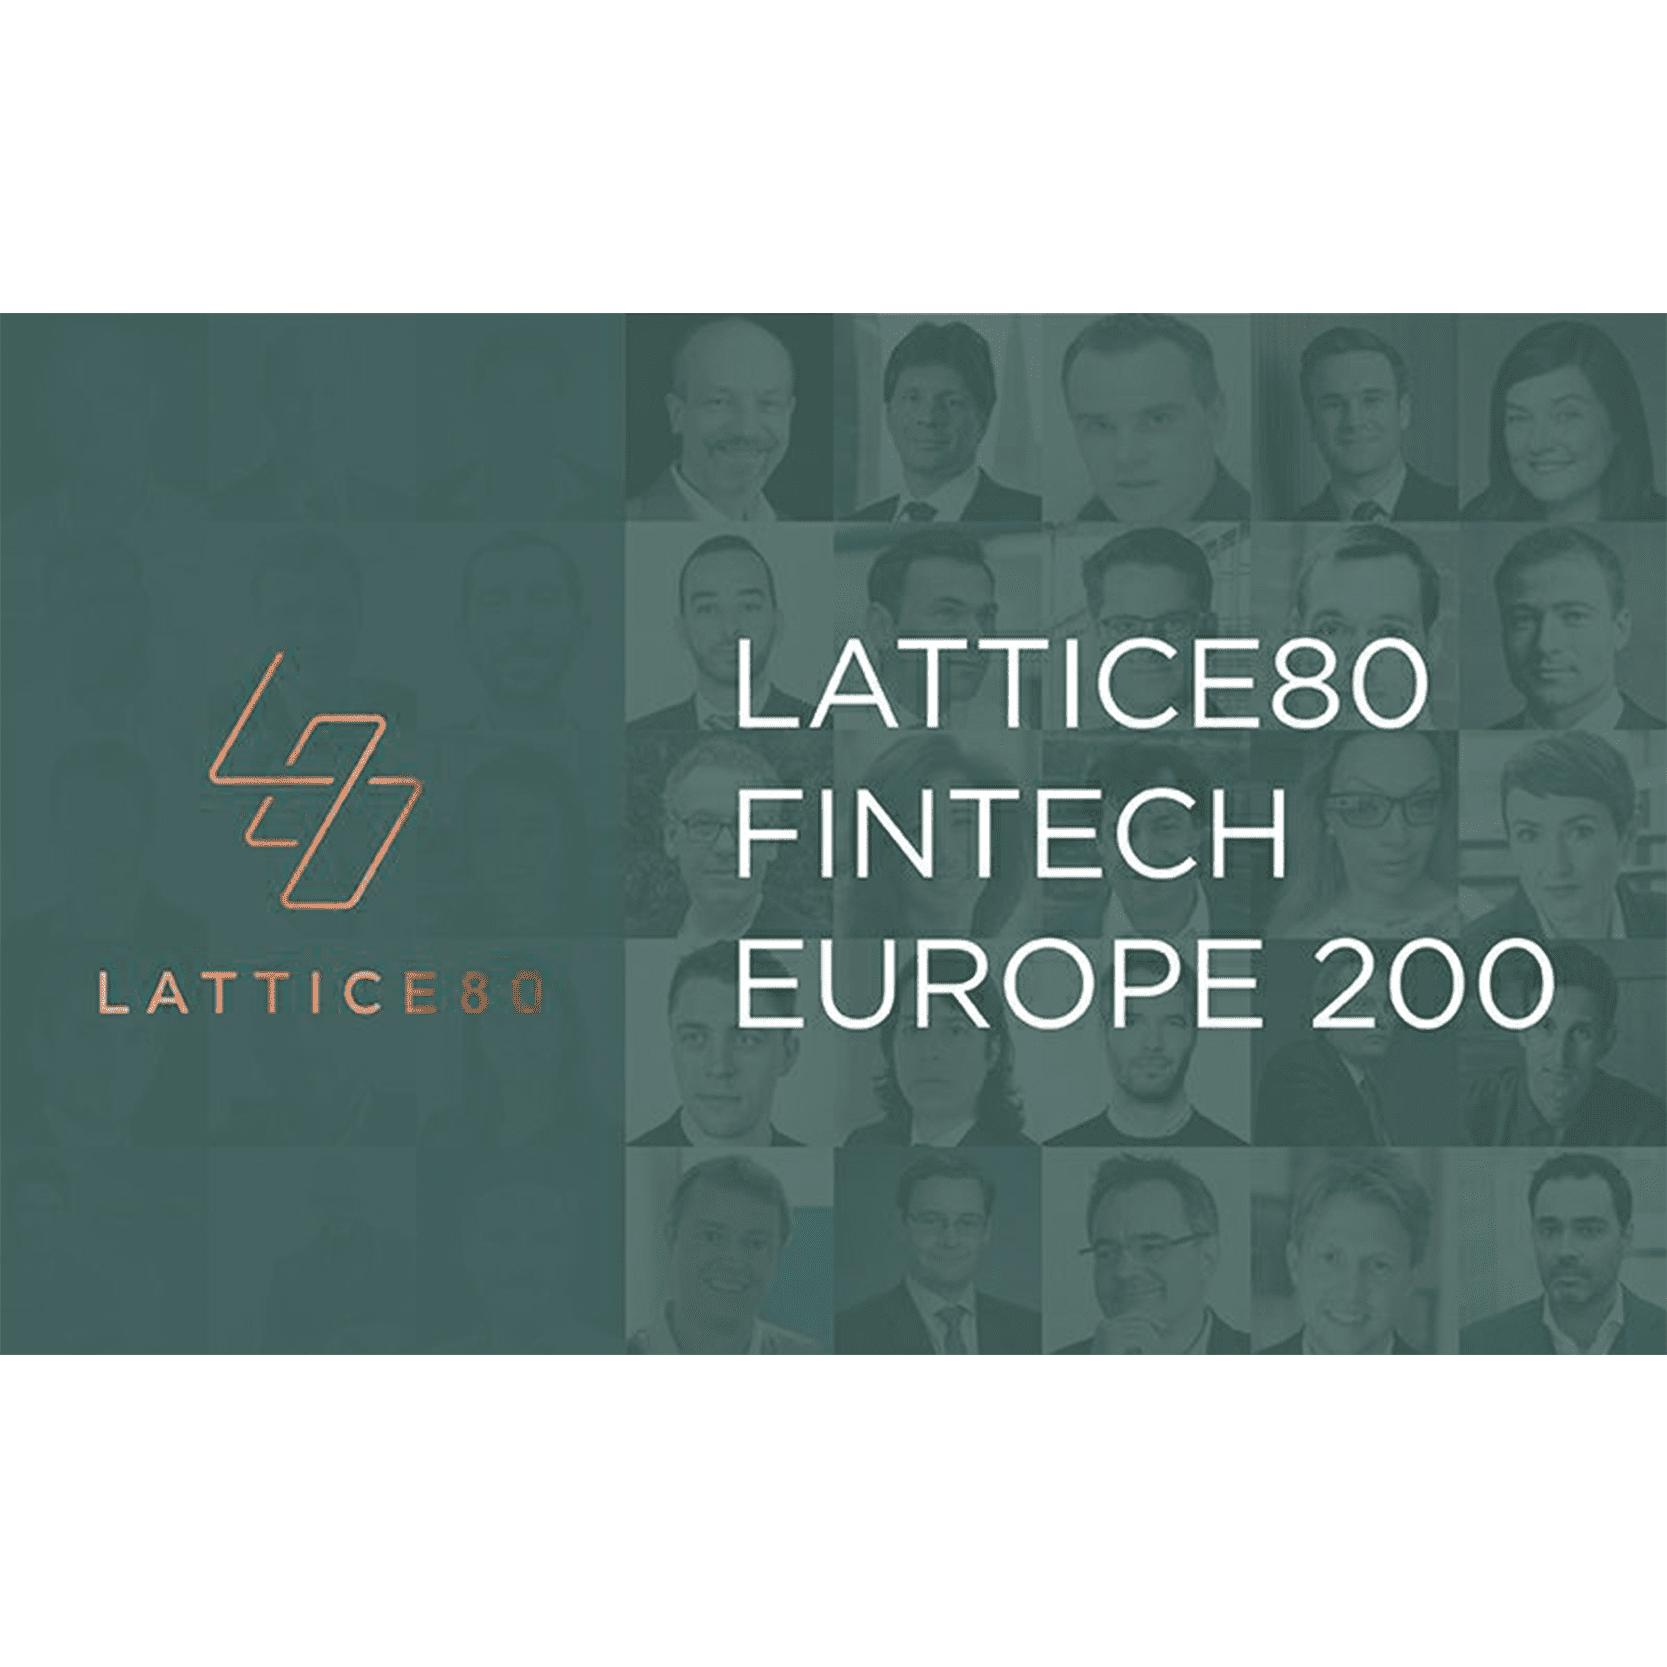 top fintech leaders influencers europe satyarth mishra lattice80